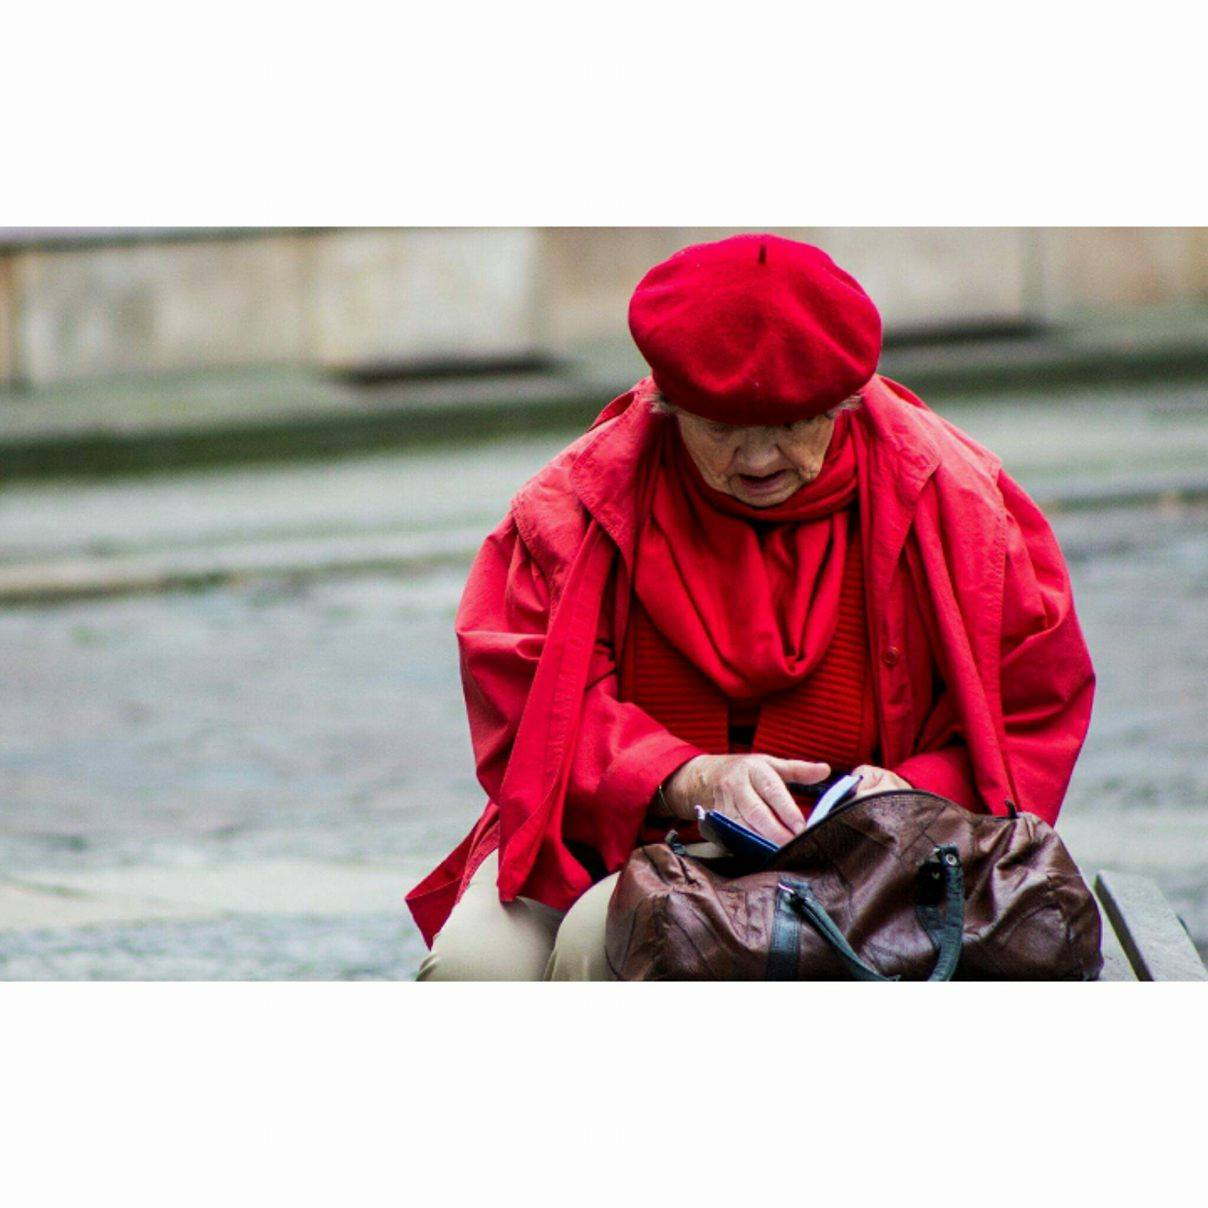 Woman in red, Berlin - October 2016